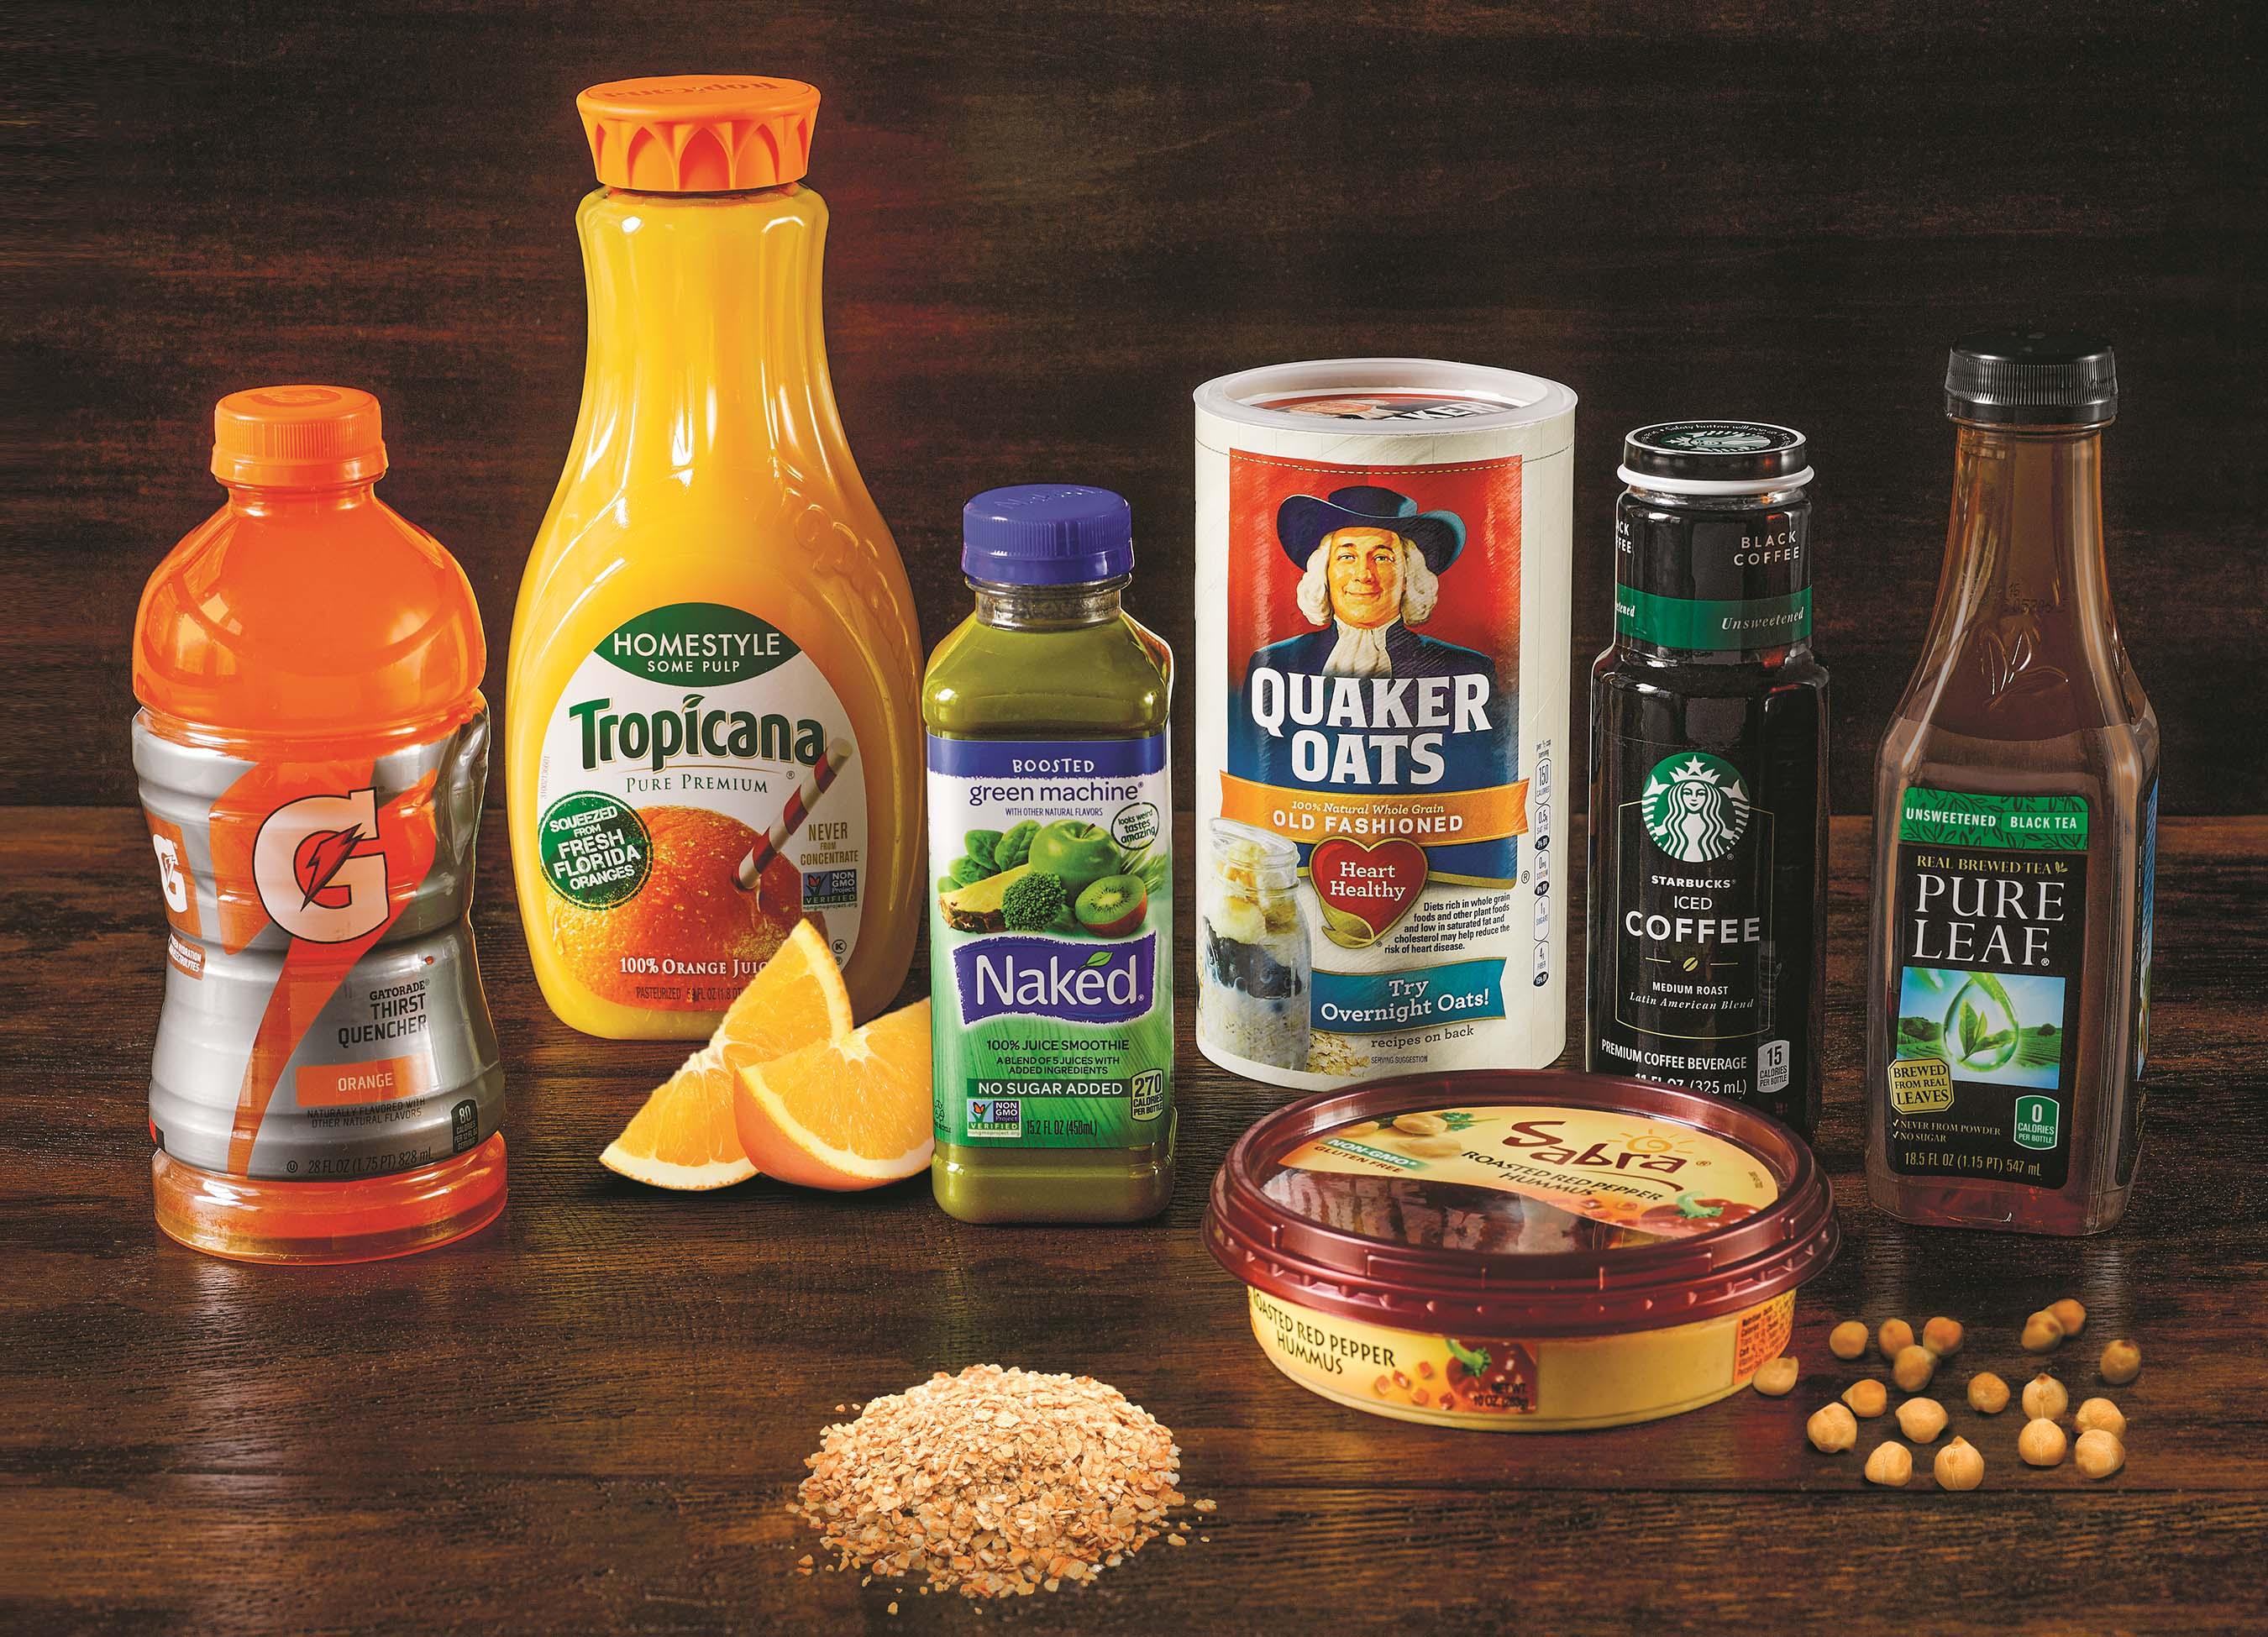 Gatorade, Tropicana juice, Naked juice, Quaker oats, Starbucks packaged coffee, Pure Leaf tea, and Sabra hummus on a table.